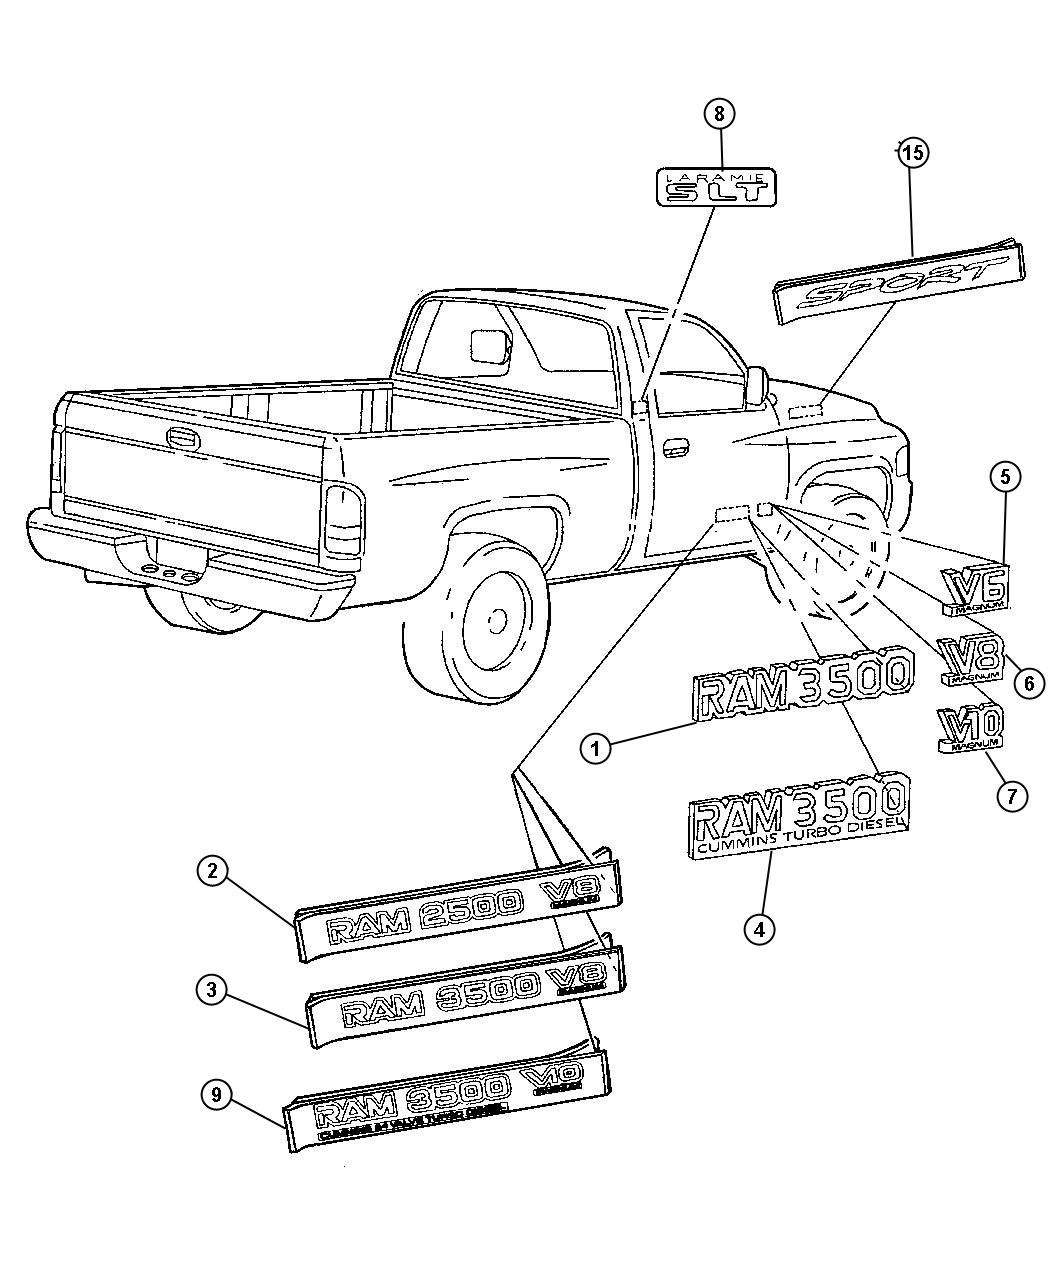 2000 Dodge Ram 2500 Nameplate. Front fender. Ram 3500